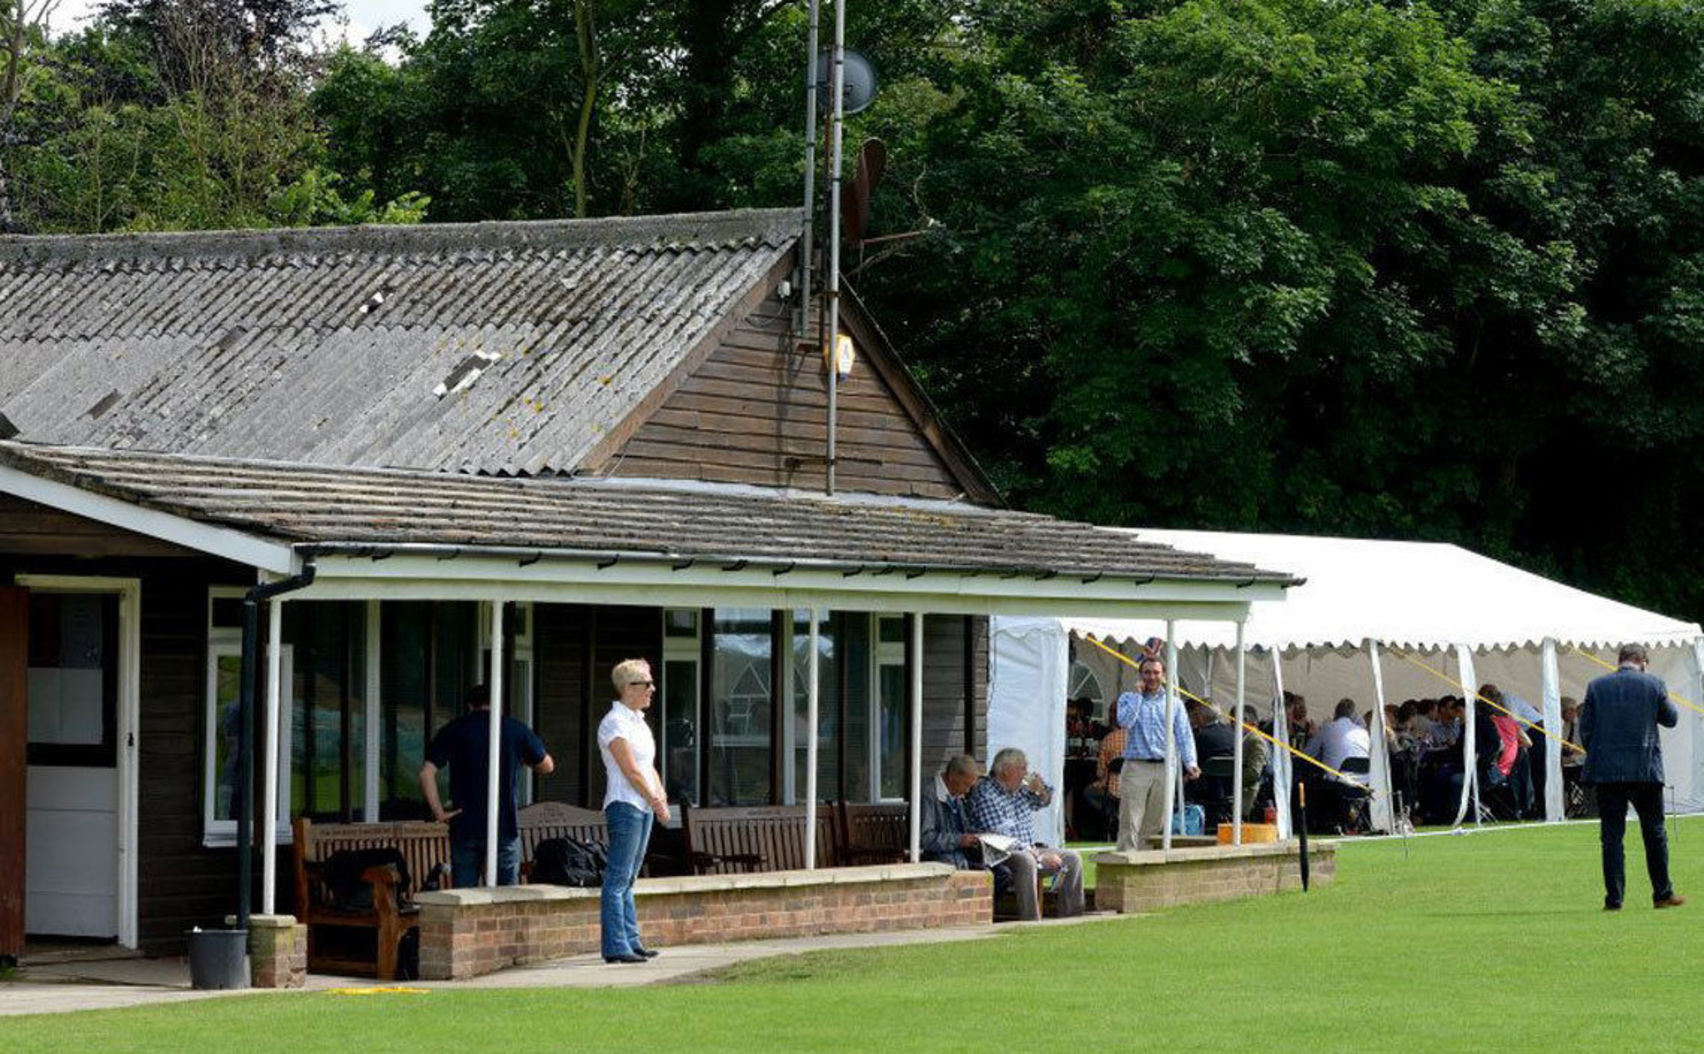 Club House, Marquee and Cricket Pitch - Full Day, Teddington Cricket Club